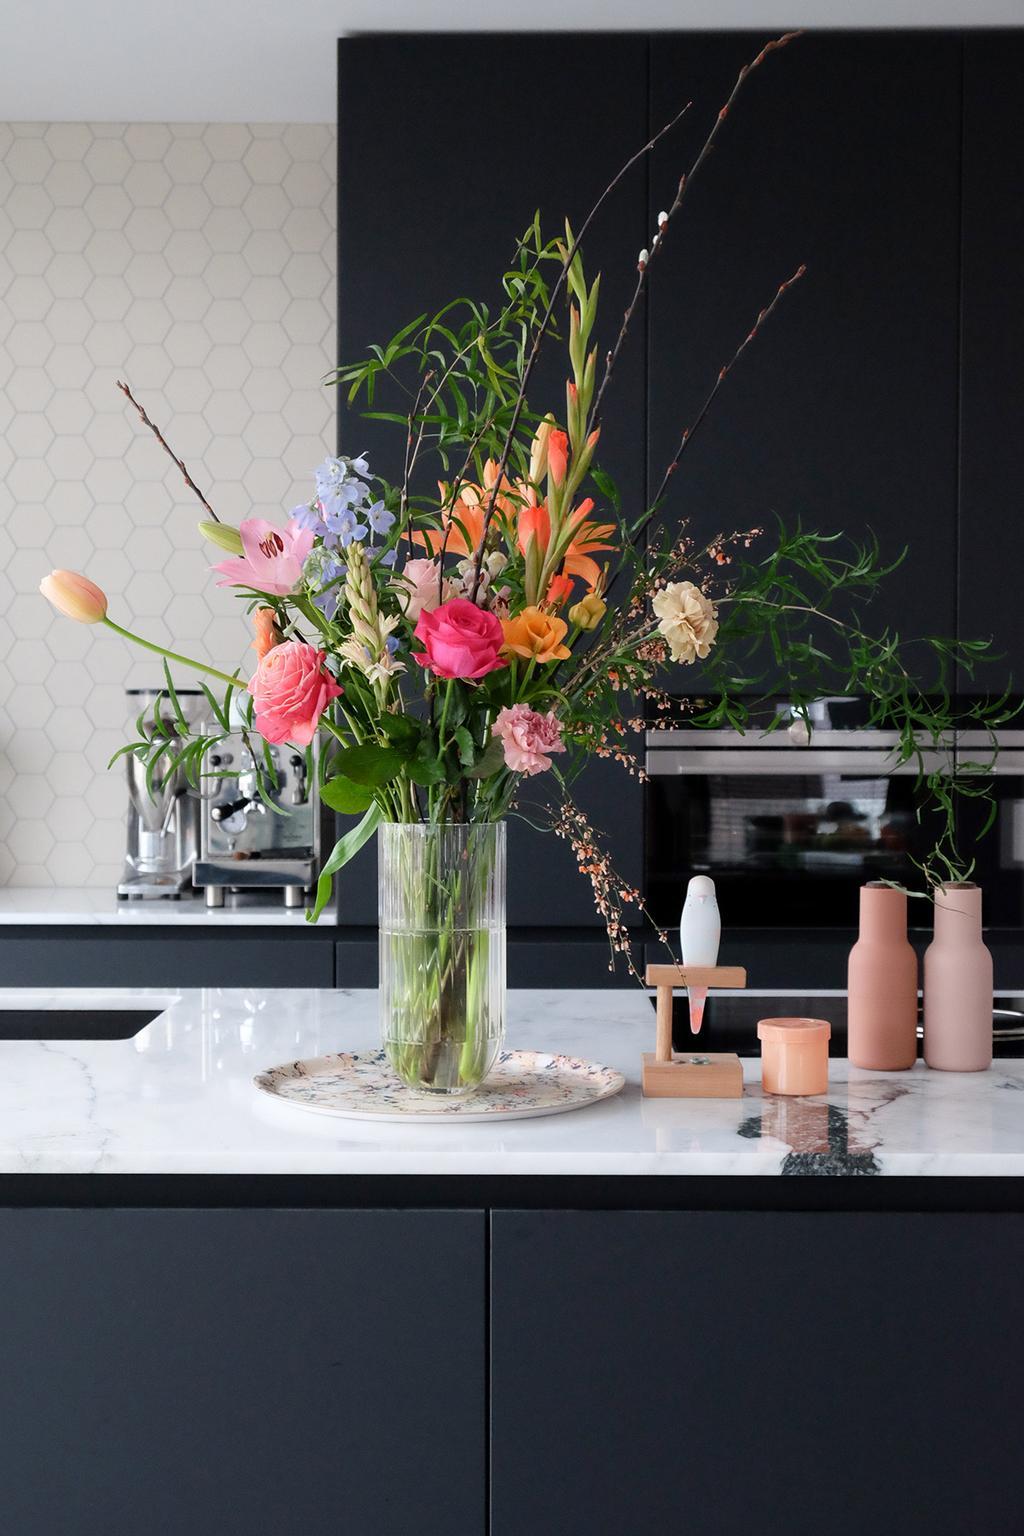 vtwonen blog PRCHTG designvazen vol kleur Hay colour vaas